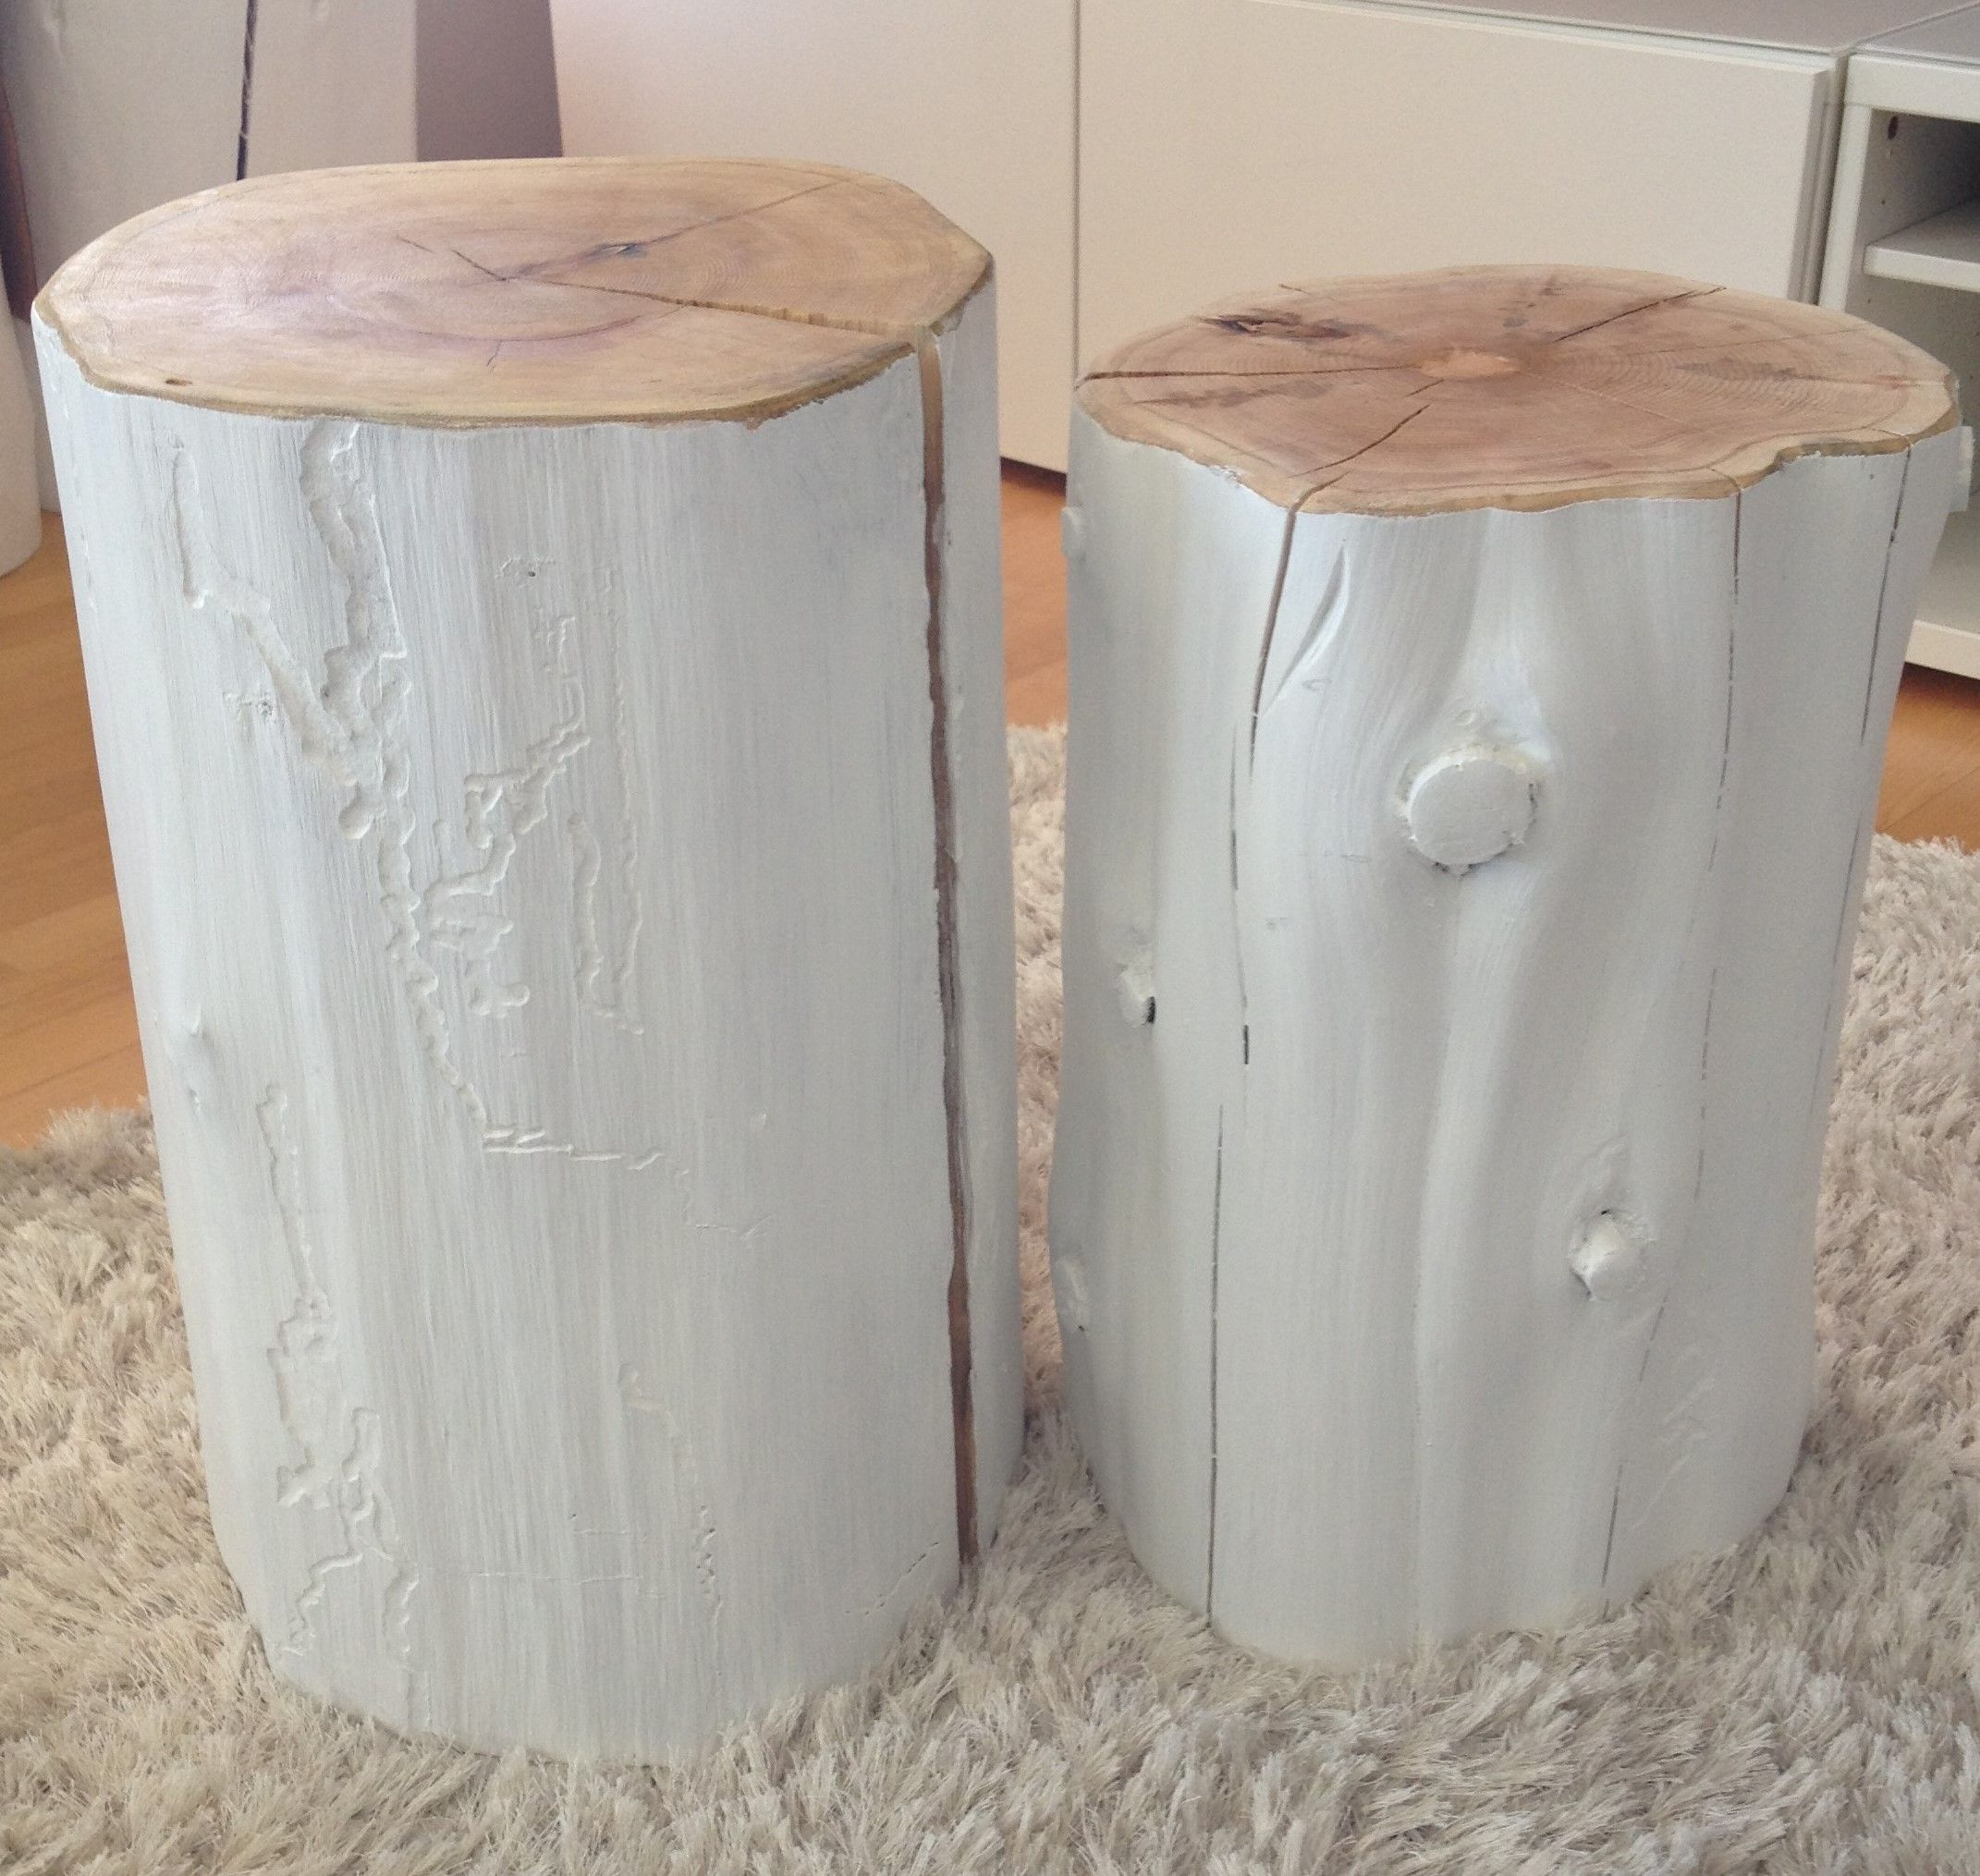 White Stump Tables Serenitystumps Com Ottawa Ontario